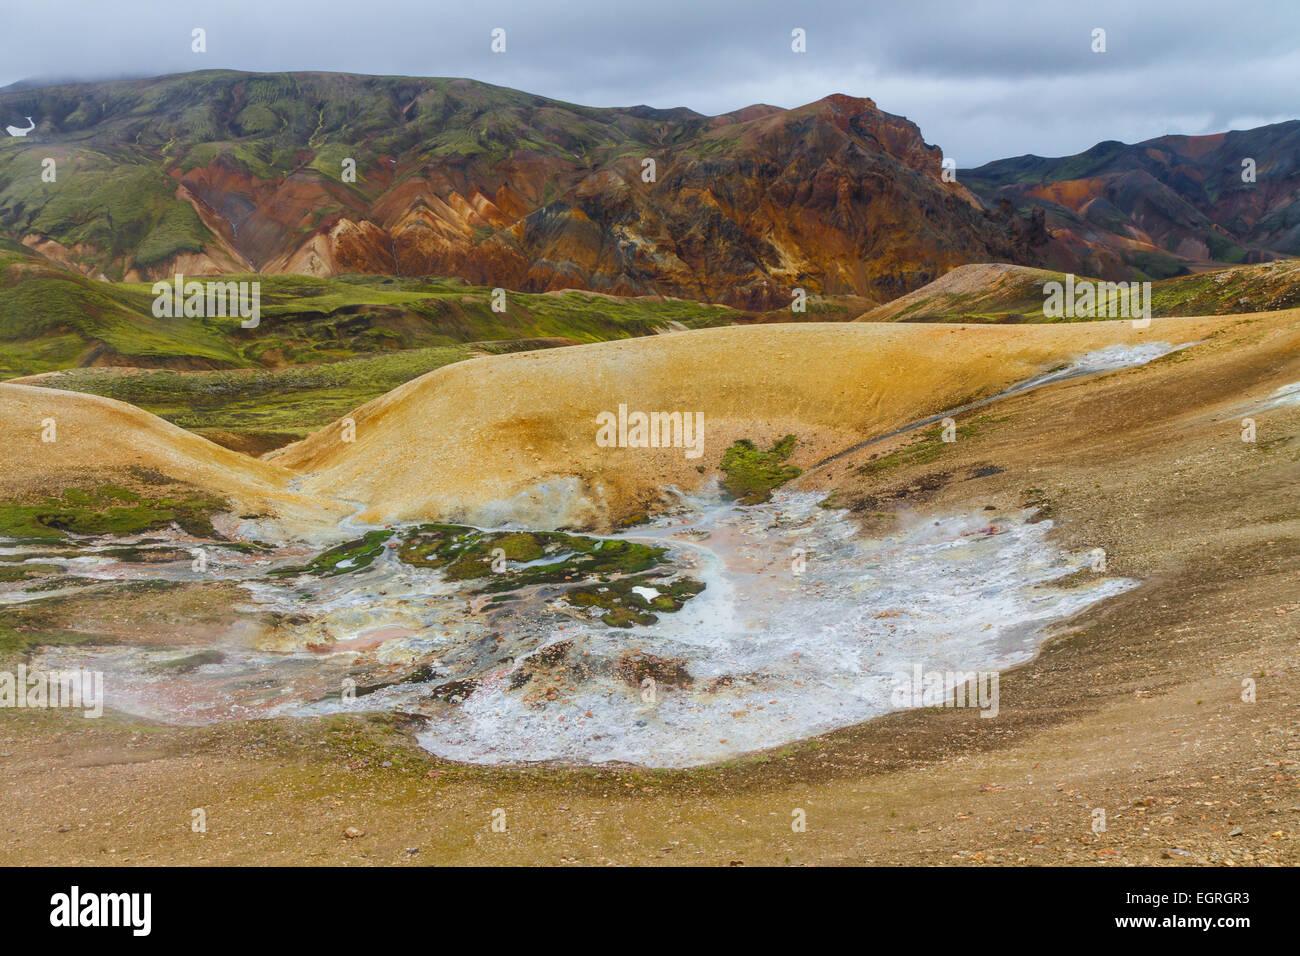 Rhyolit Berge im Hochland von Island Stockbild